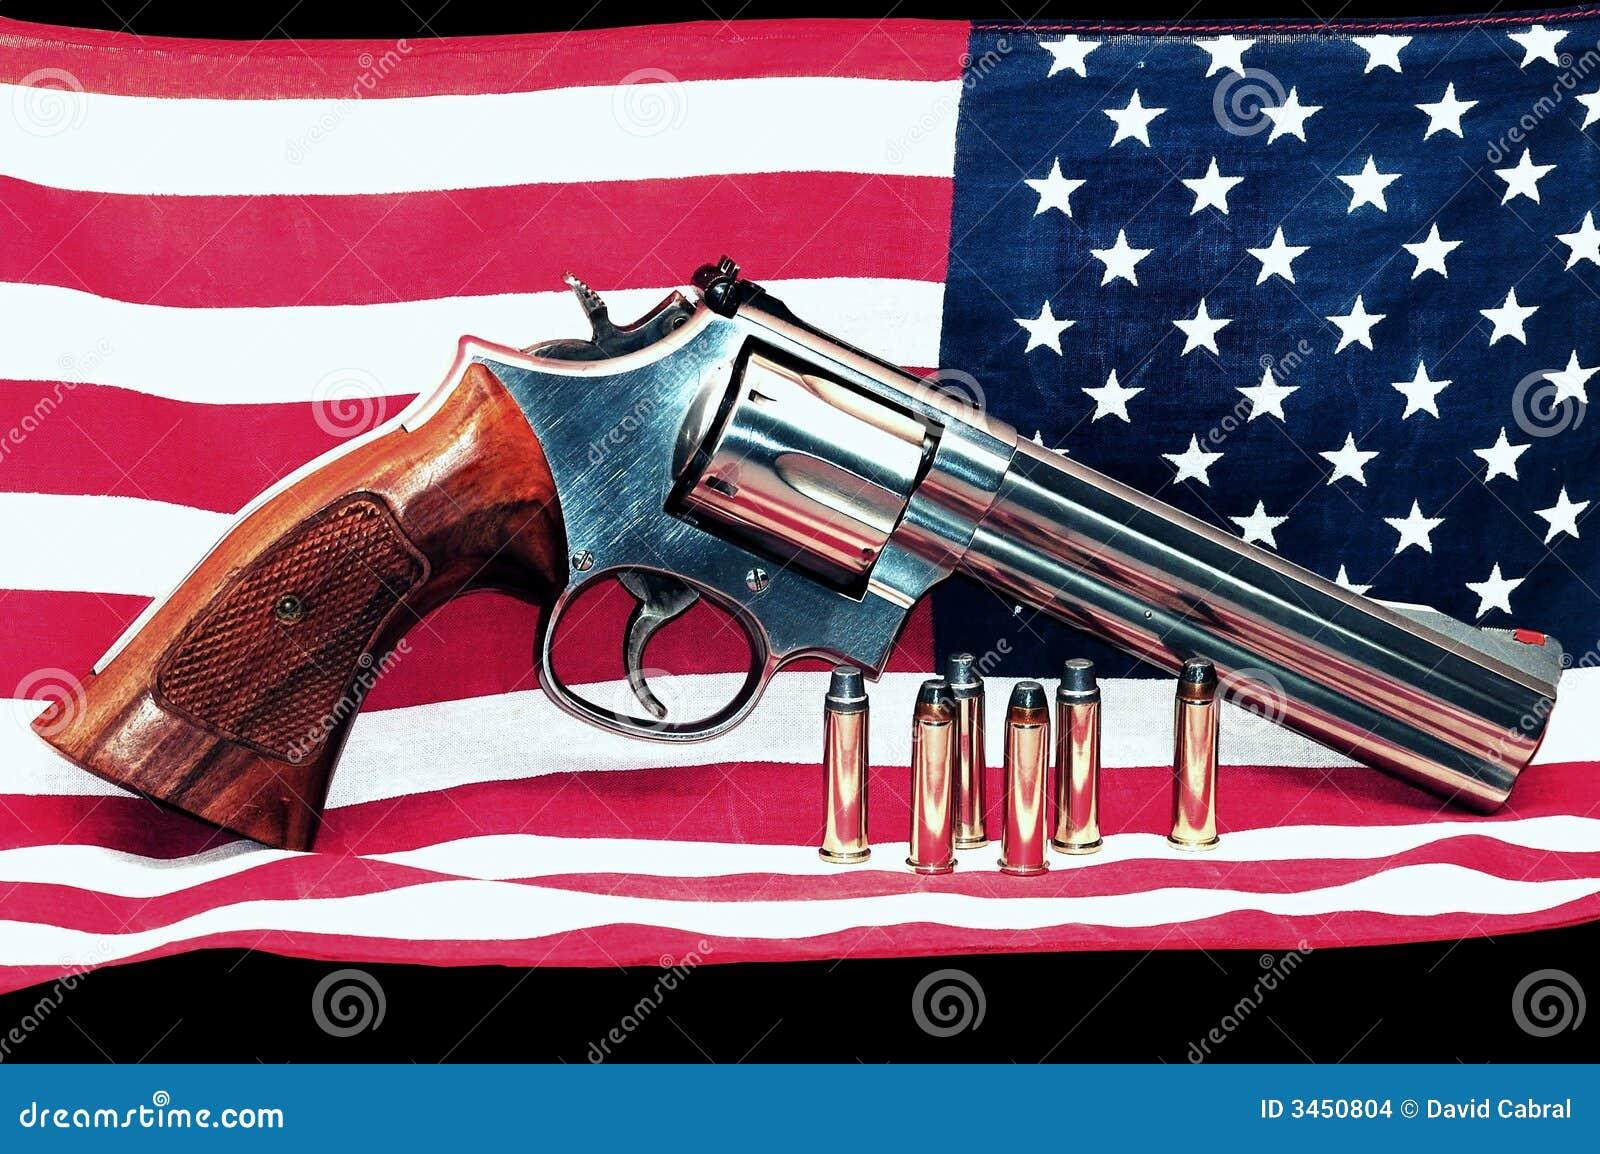 American flag and gun